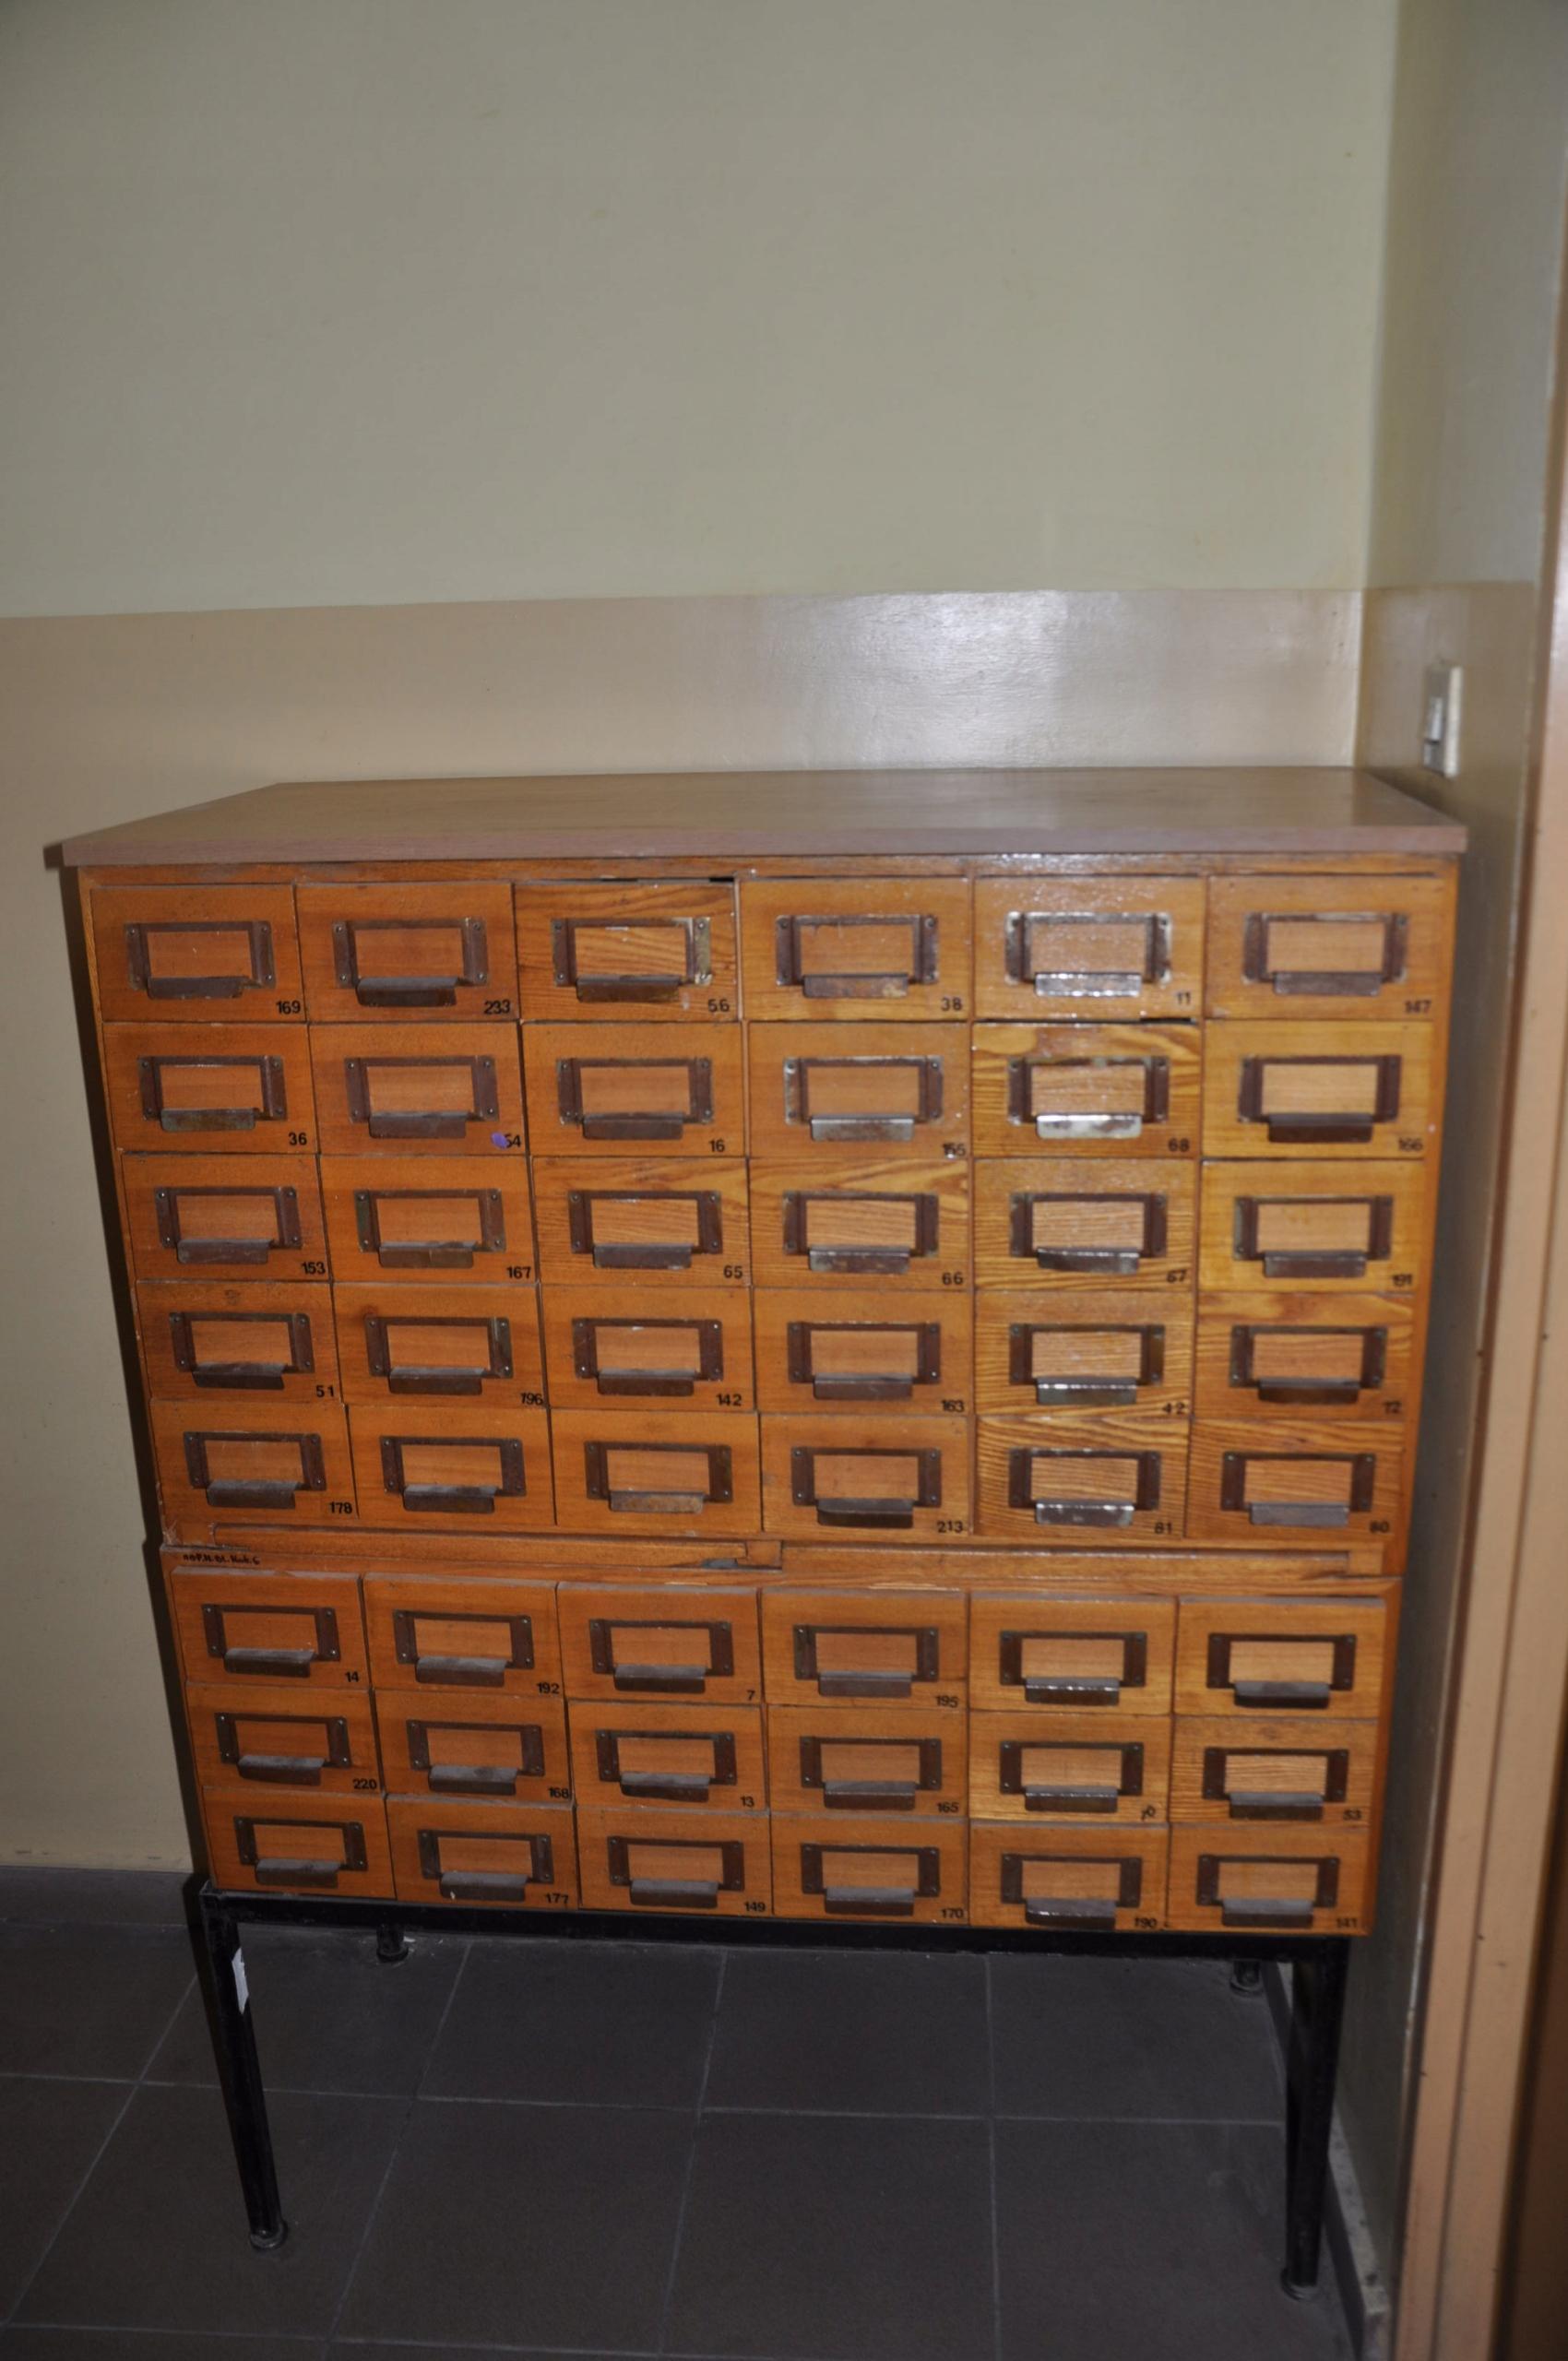 Zaawansowane Szafka biblioteczna - 7450559184 - oficjalne archiwum allegro EA31